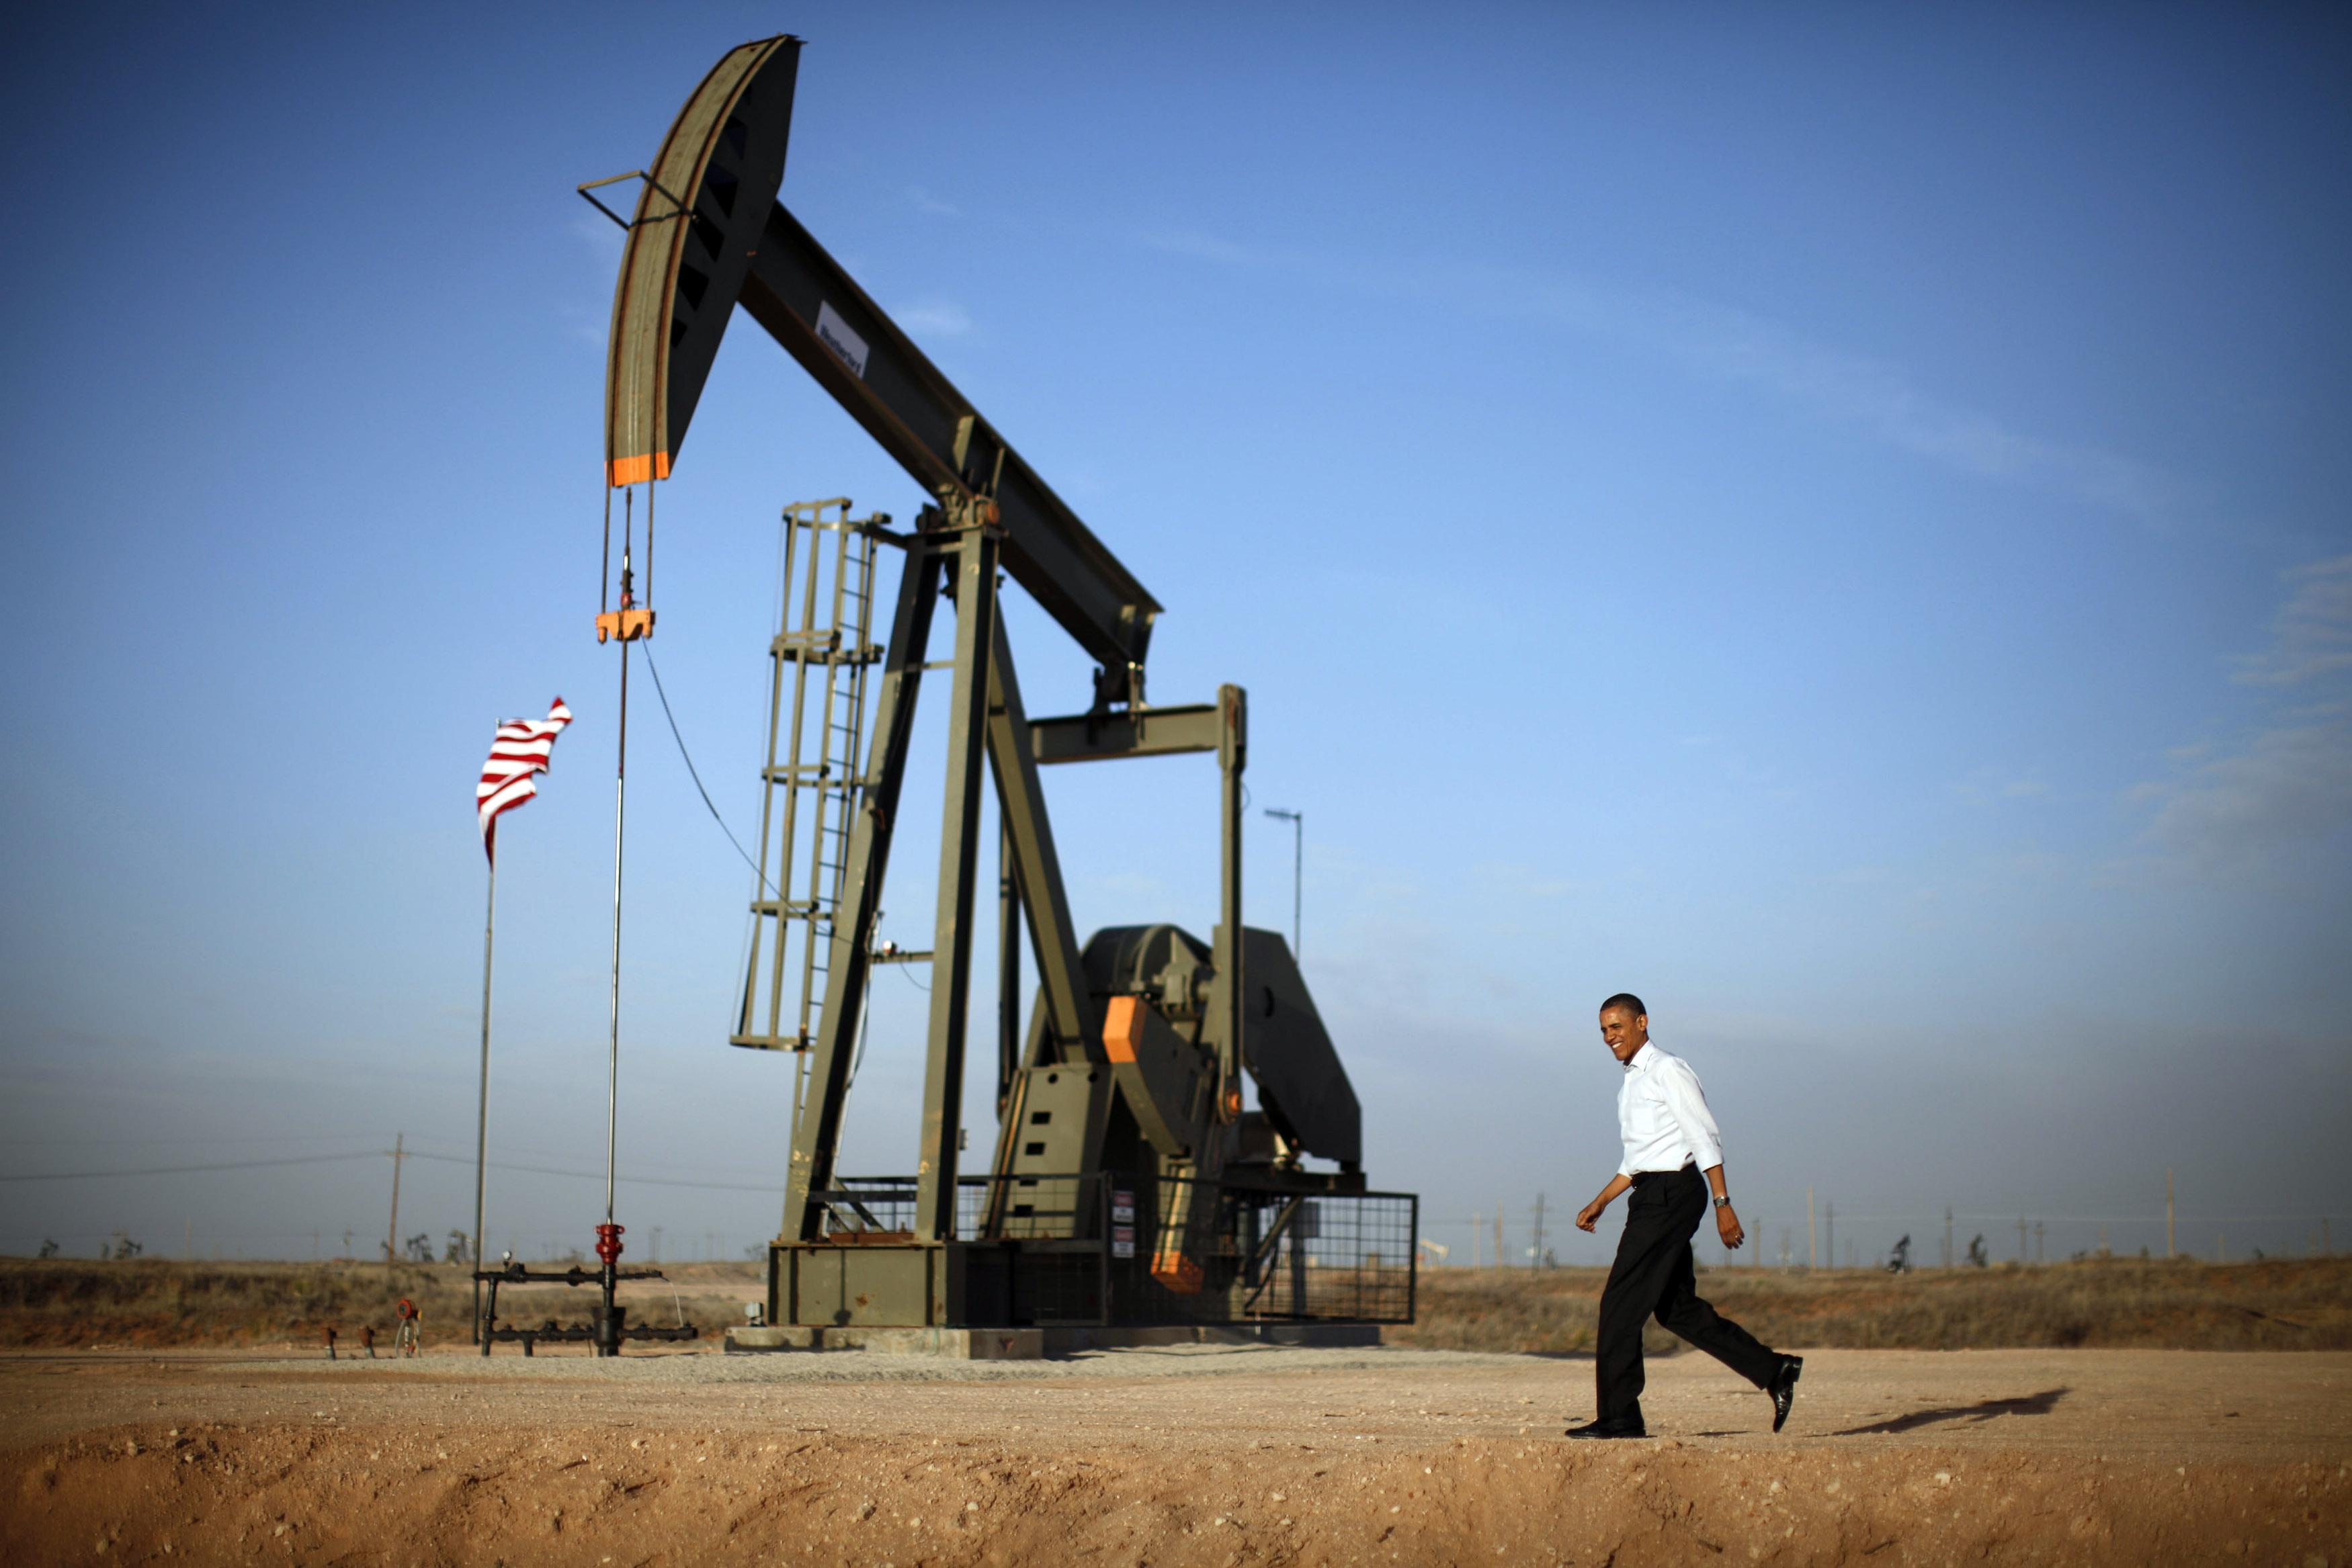 EU produjo 11.6 millones de barriles de crudo al día en 2014, contra los 11.5 millones de barriles diarios por parte de Arabia Saudita.